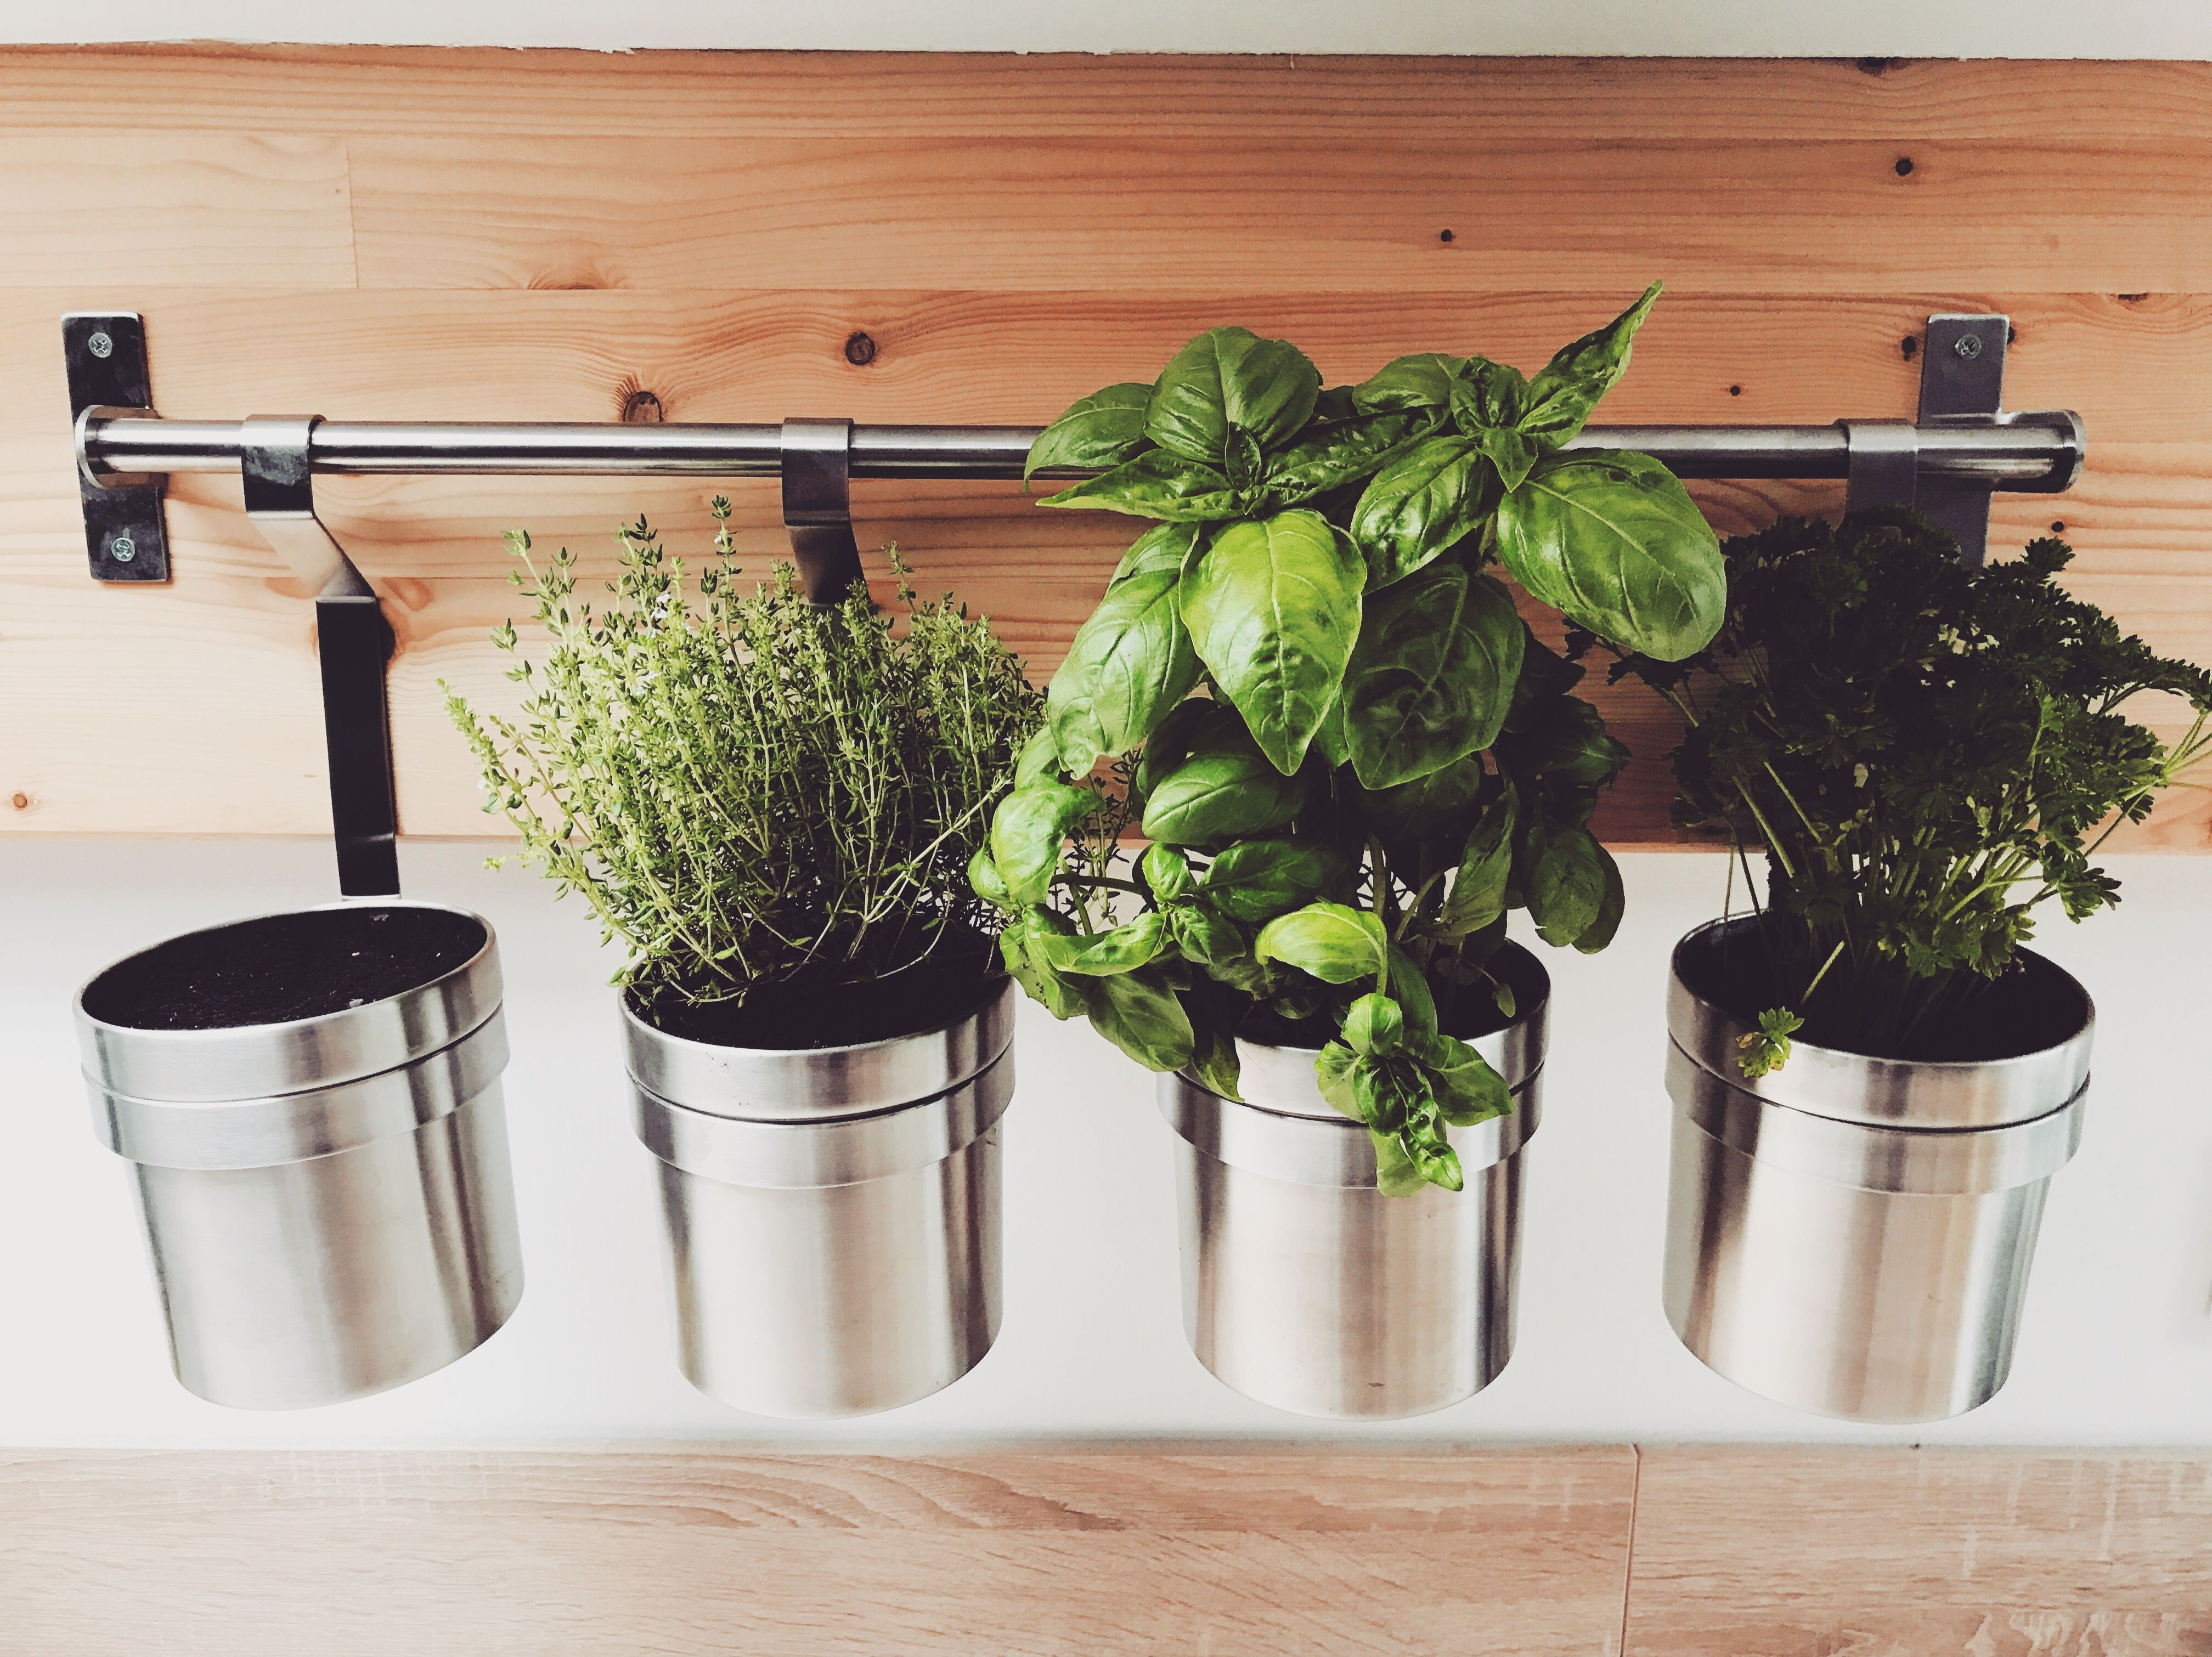 jardinage déco plantesaromatiques basilic thym